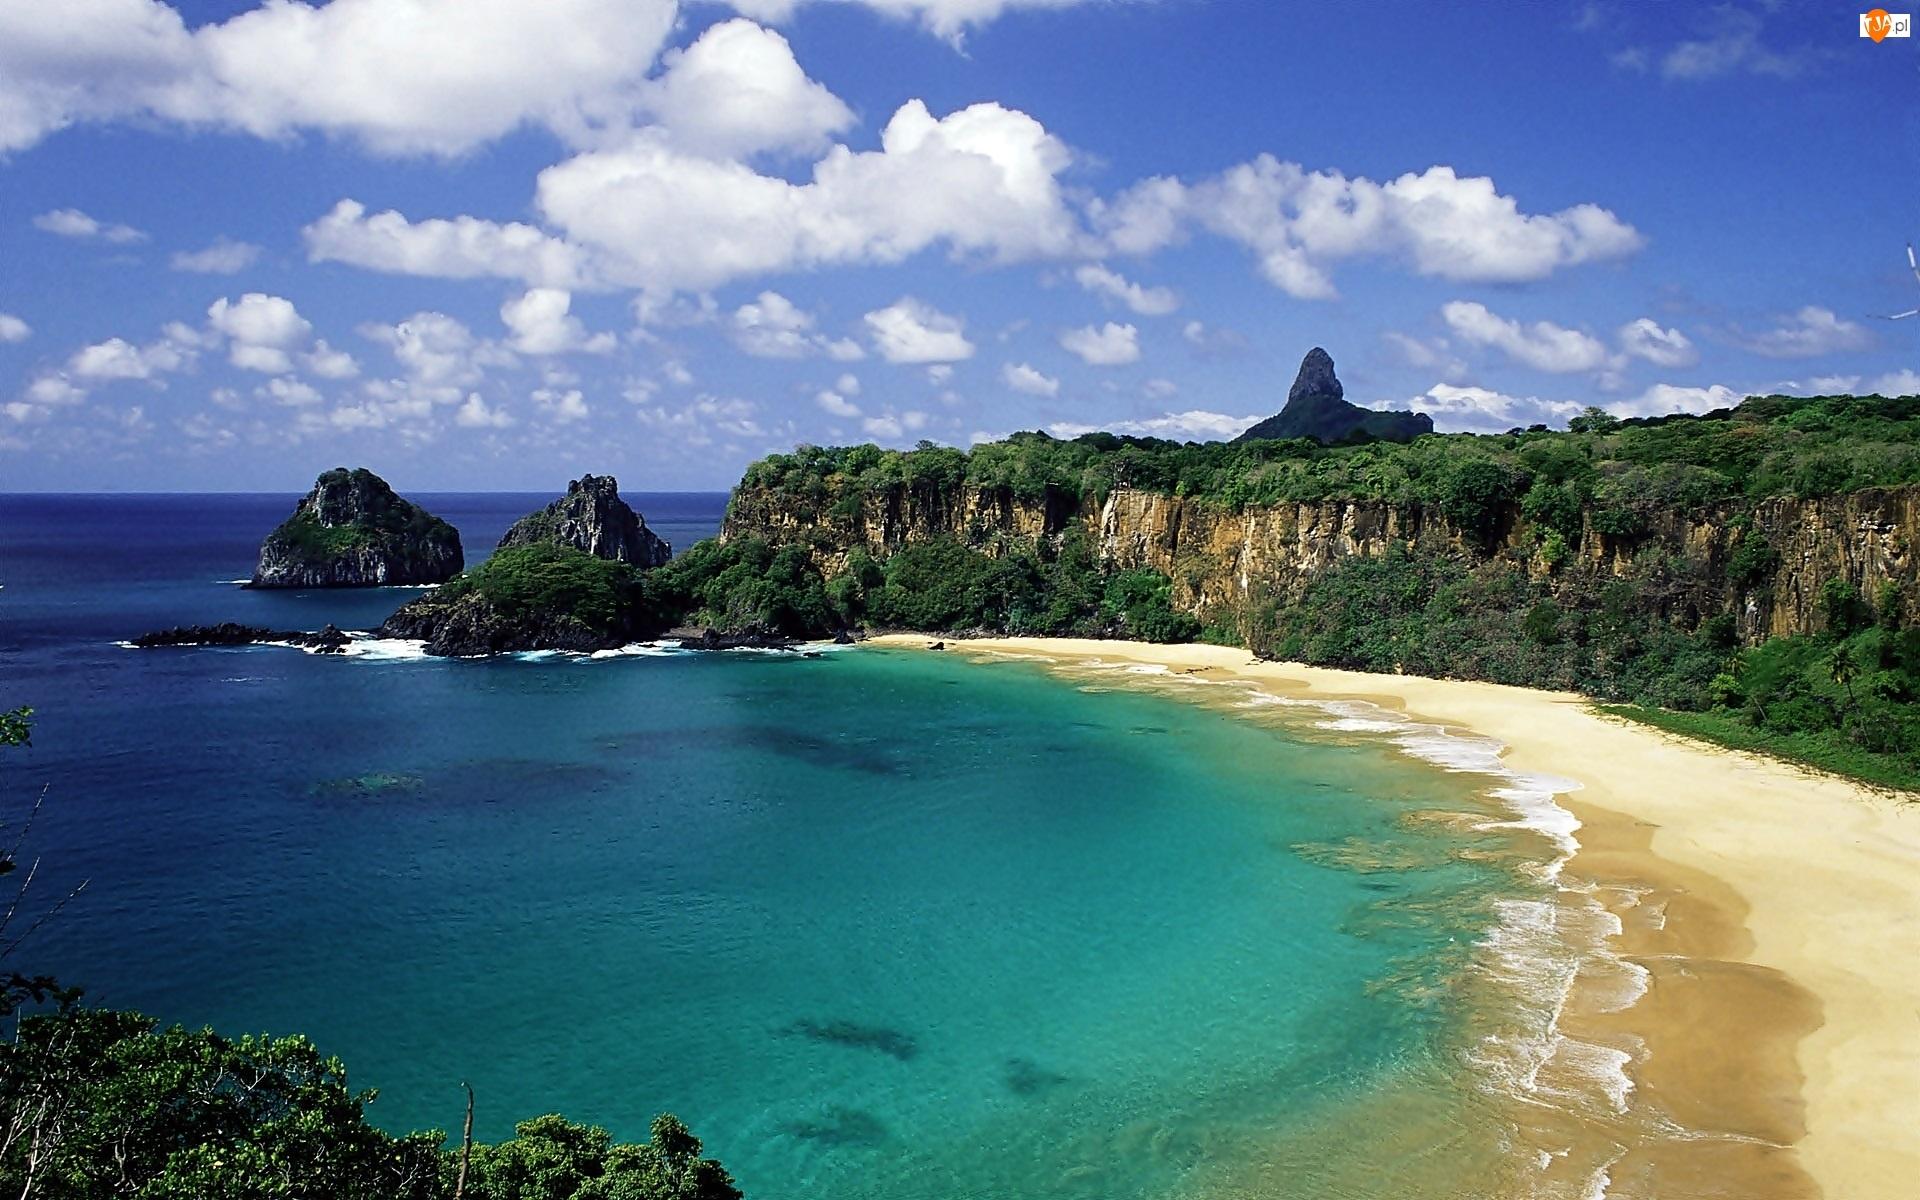 Archipelag, Dżungla, Plaża, Morze, Fernando de Noronha, Skały, Obłoki